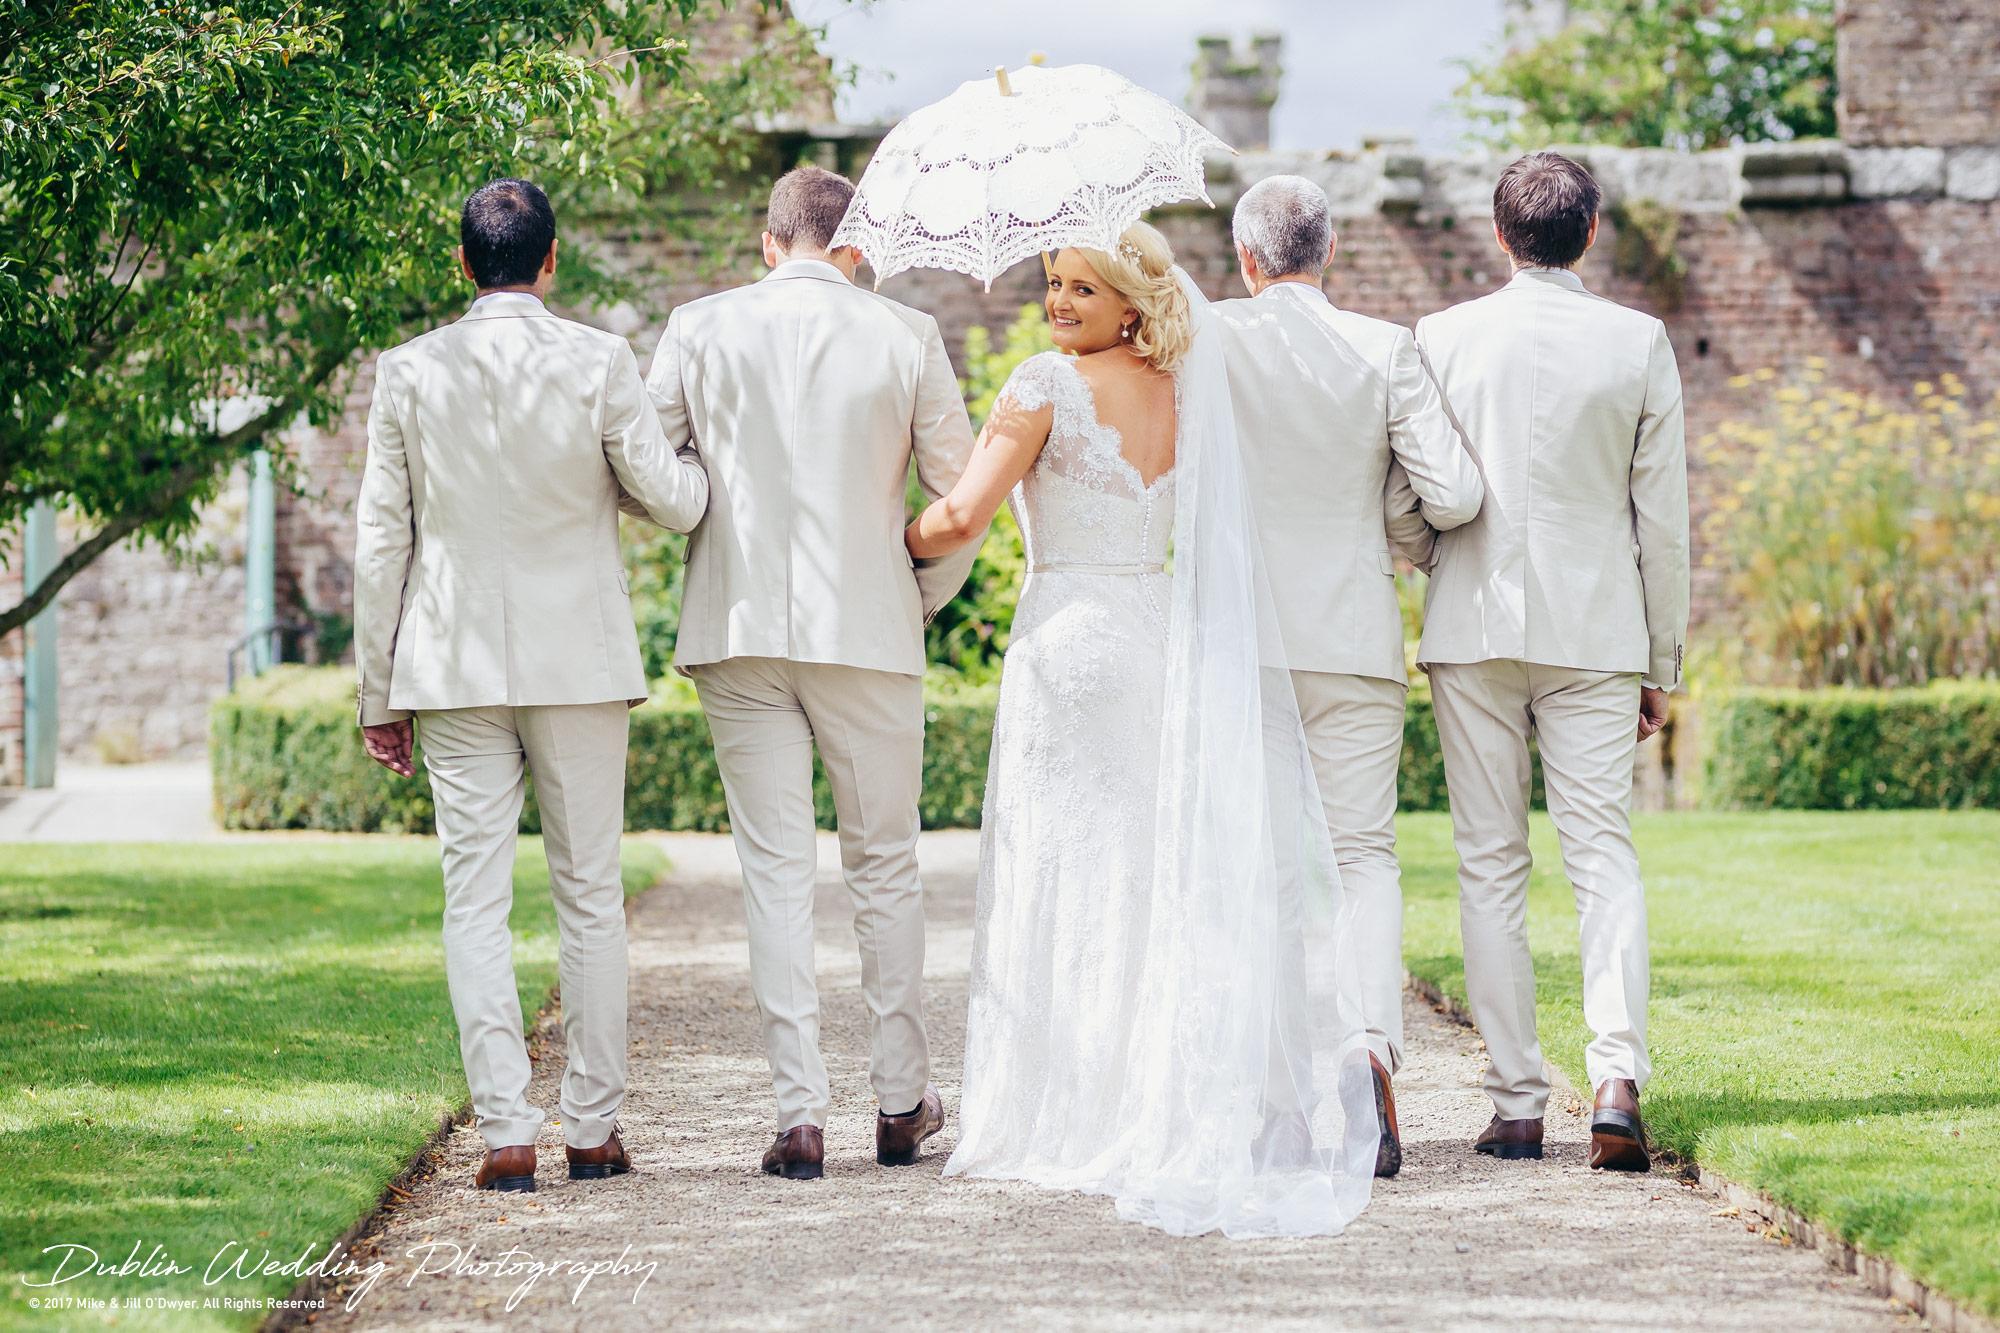 Wedding Photographer Ducketts Grove Bride & Groom and Groomsmen